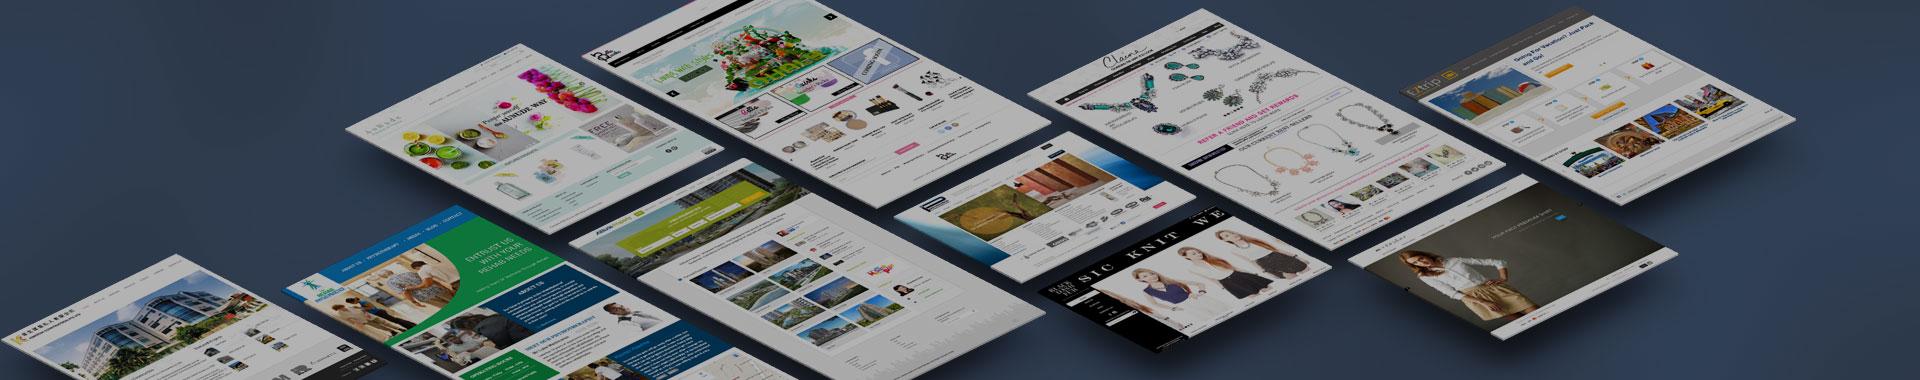 Website Design Singapore - The Little Affair